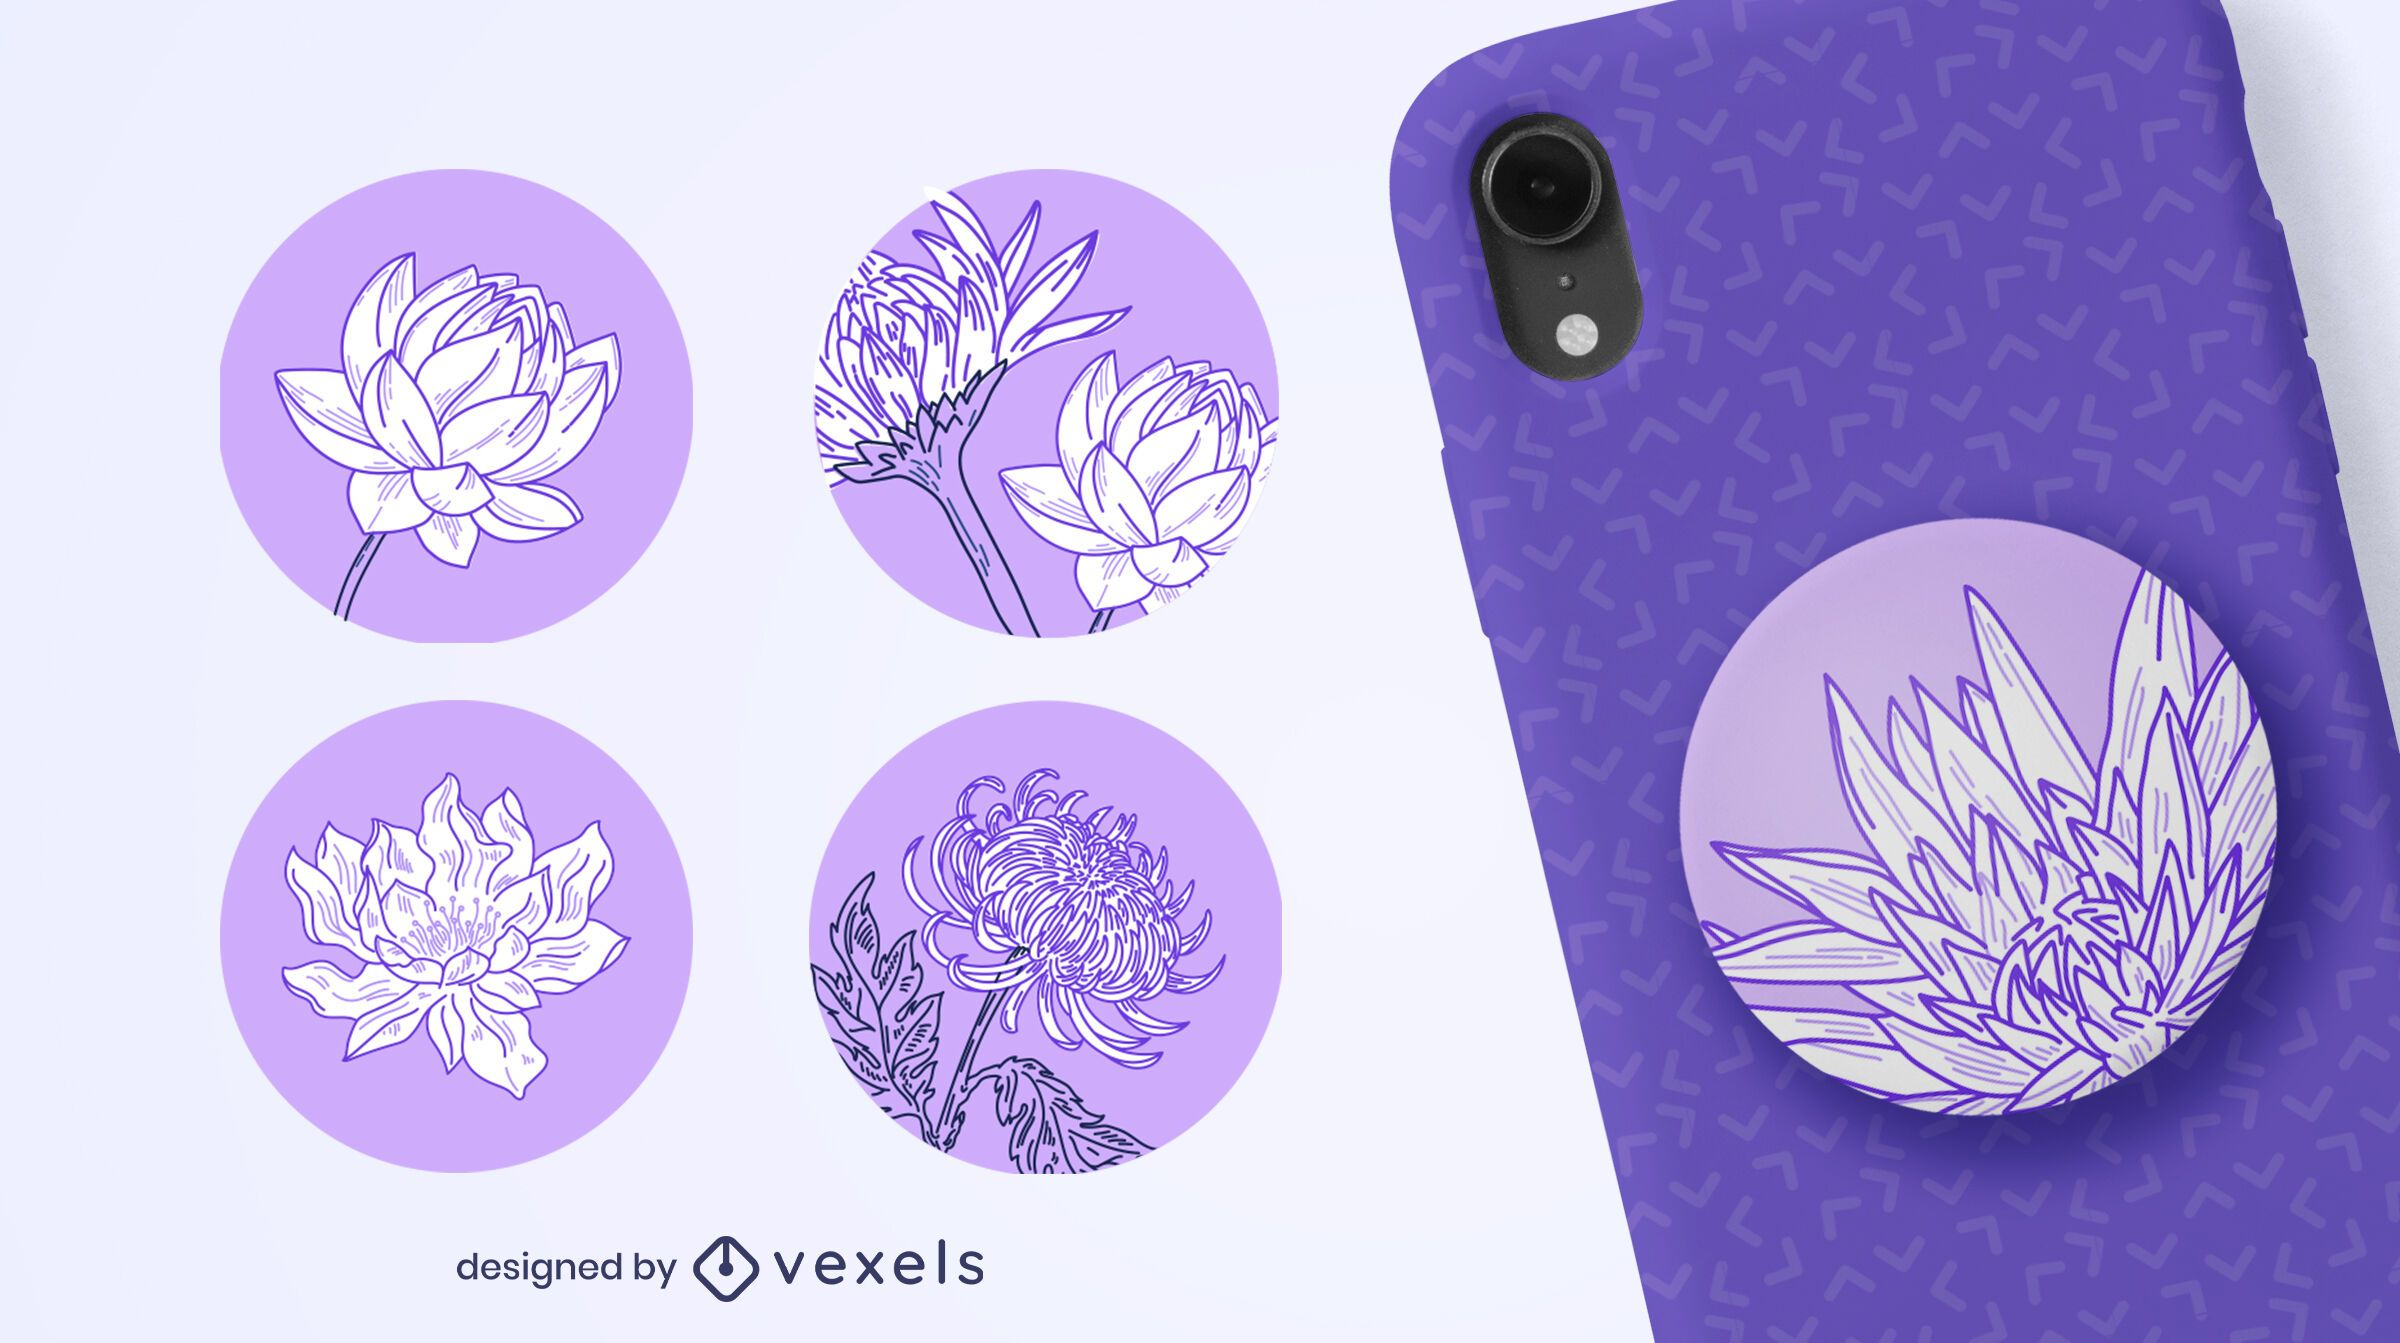 Hand drawn flowers popsocket set